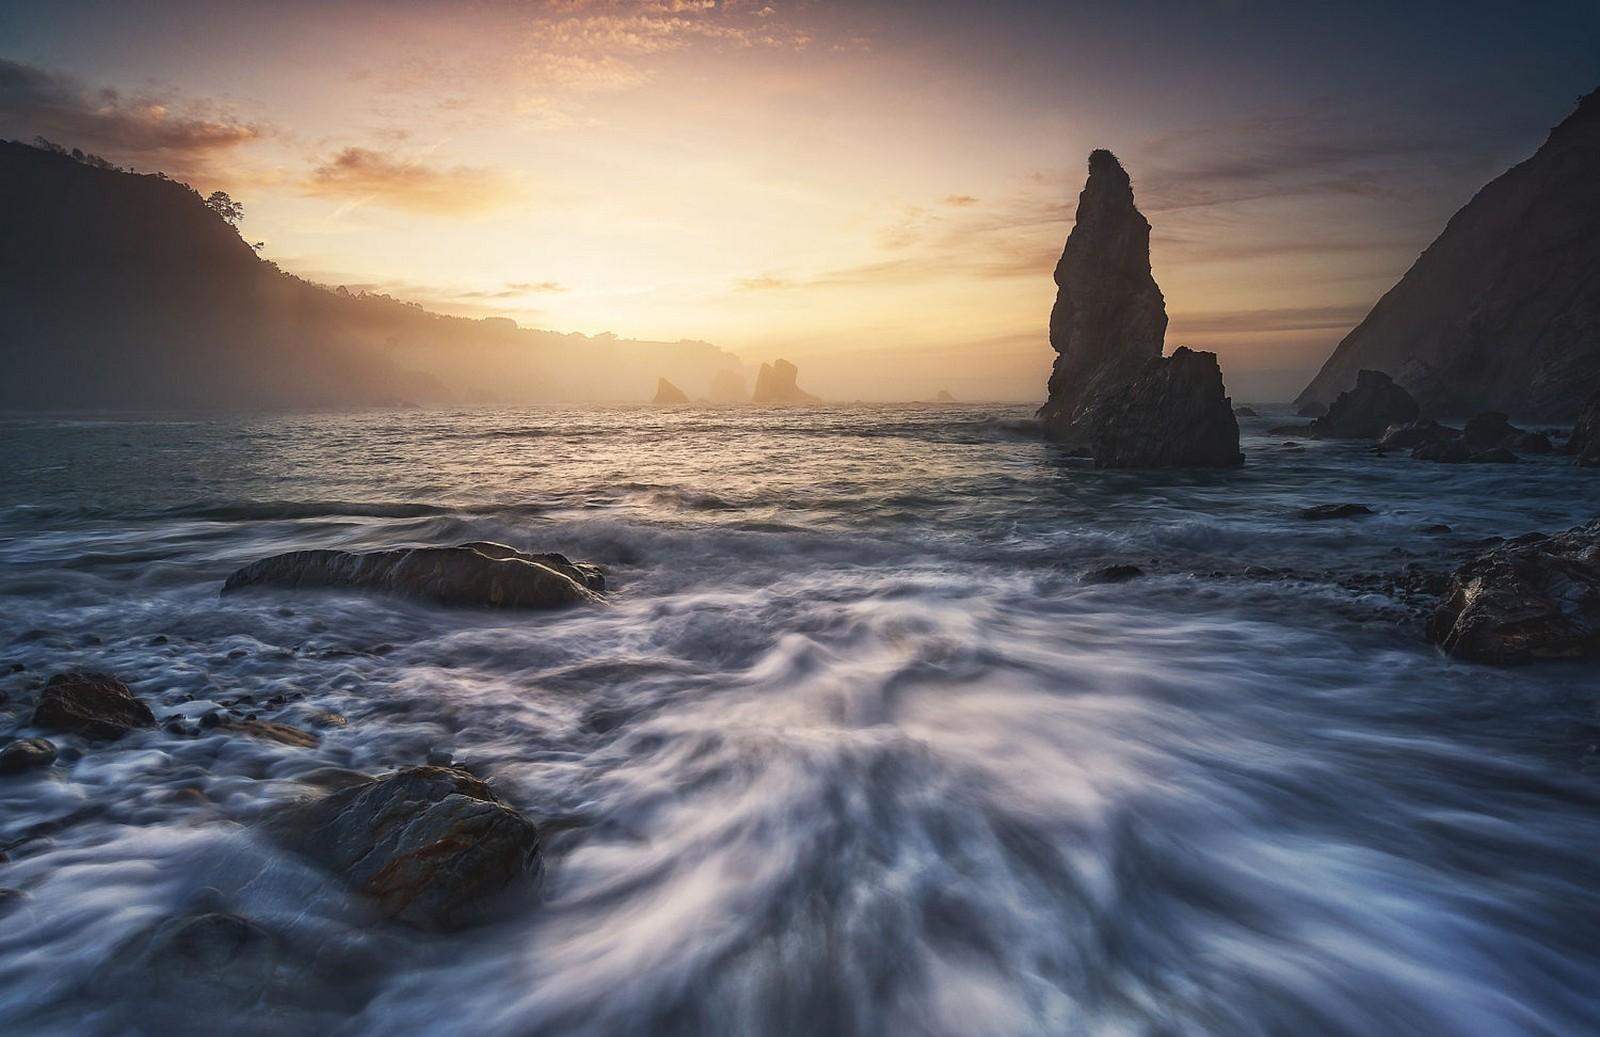 General 1600x1037 photography landscape nature beach rock hills sea Spain long exposure